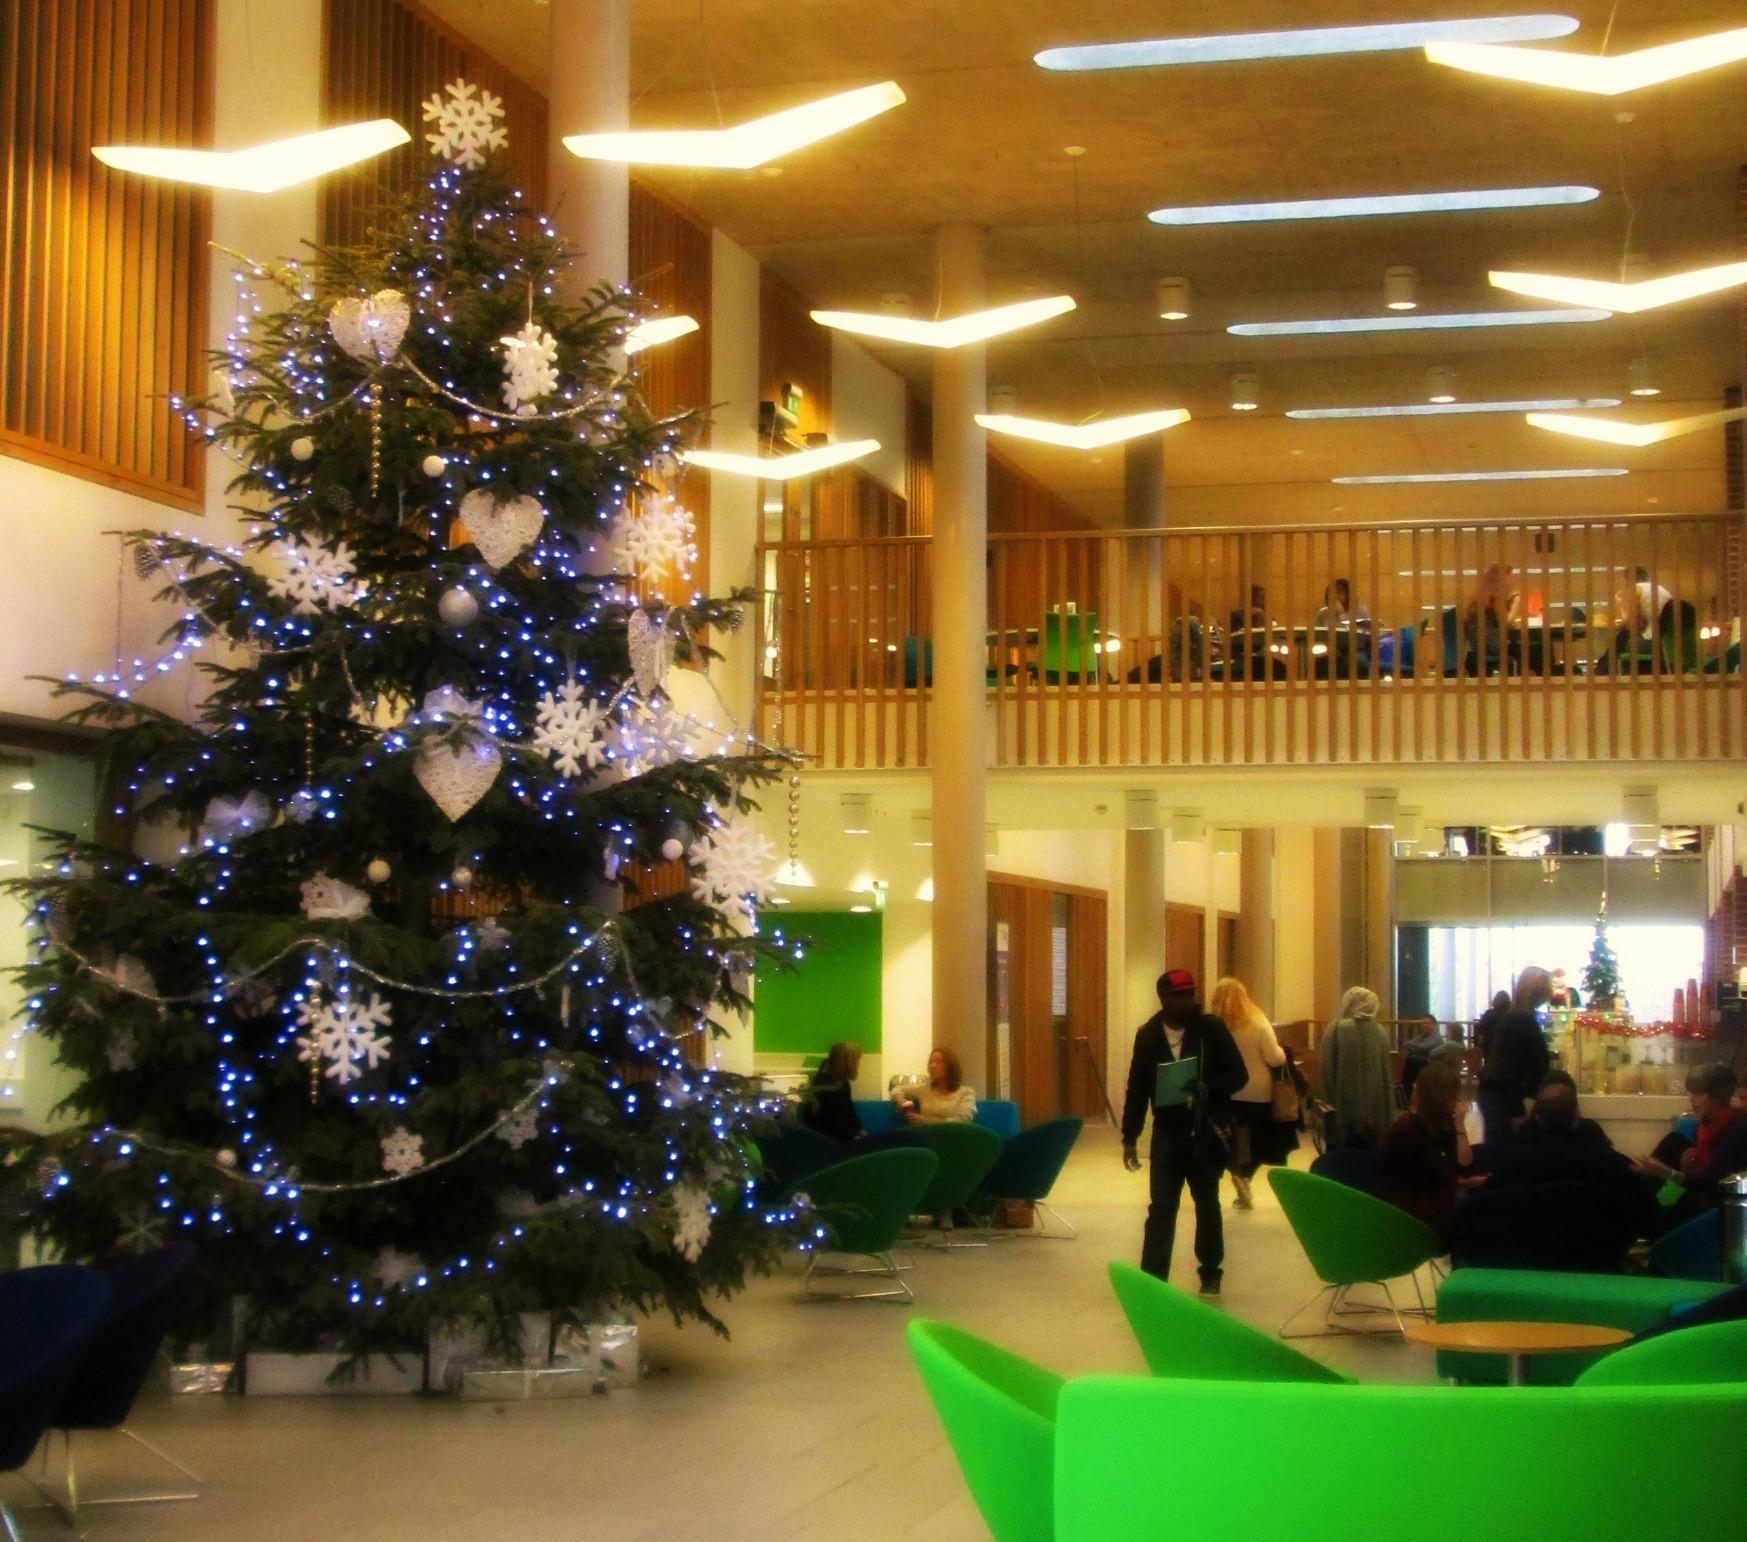 Newman Christmas Trees.Encounter The Gospels Through First Century Eyes Newman